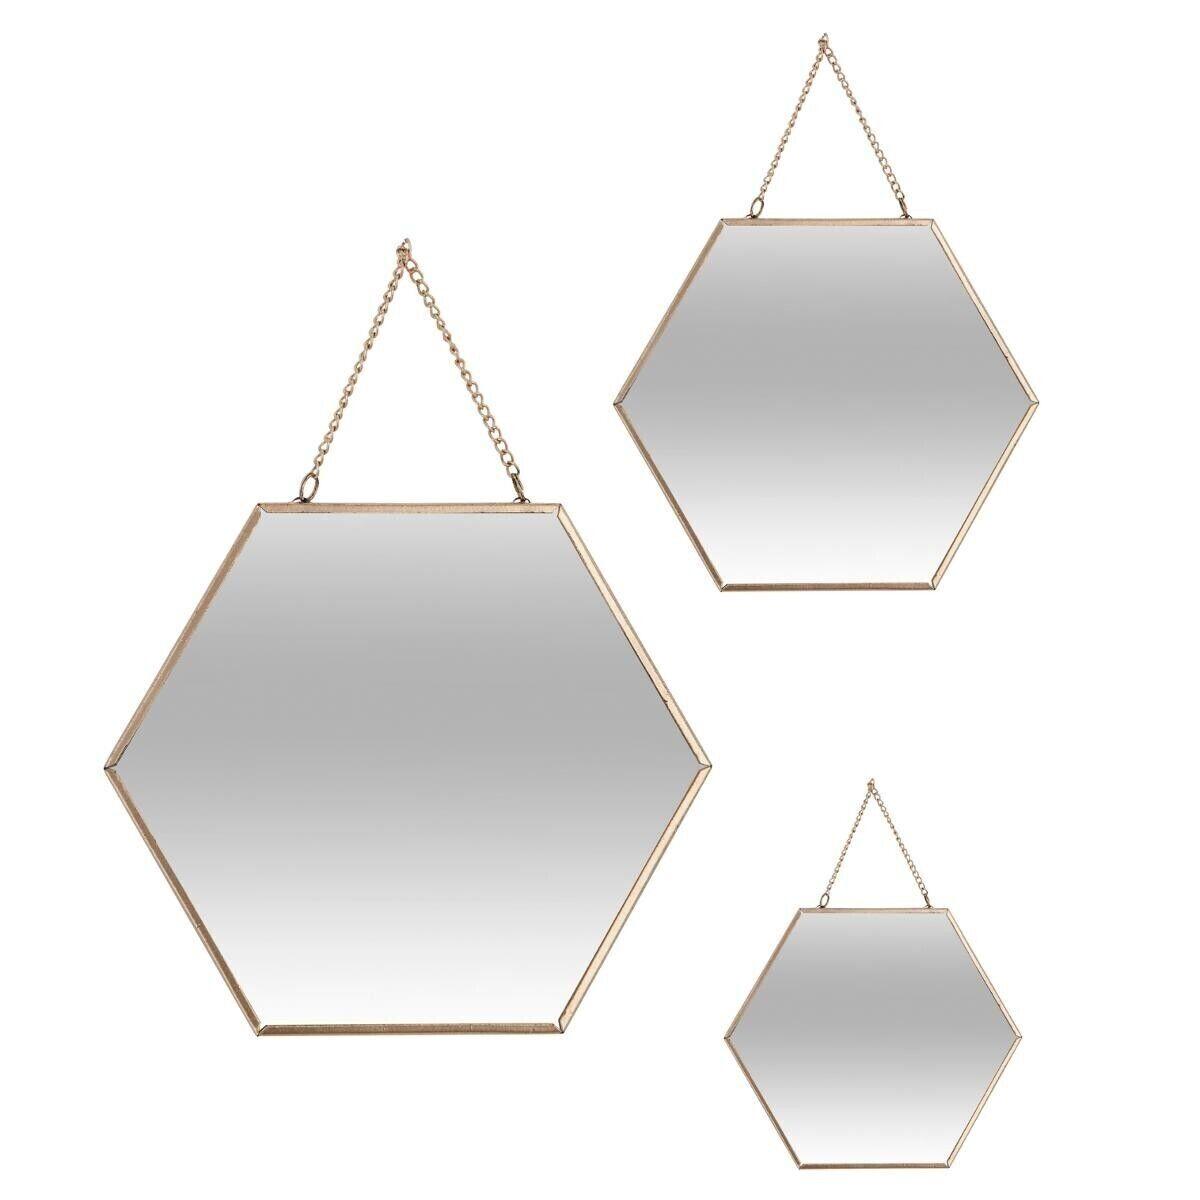 Atmosphera Set de 3 miroirs dorés